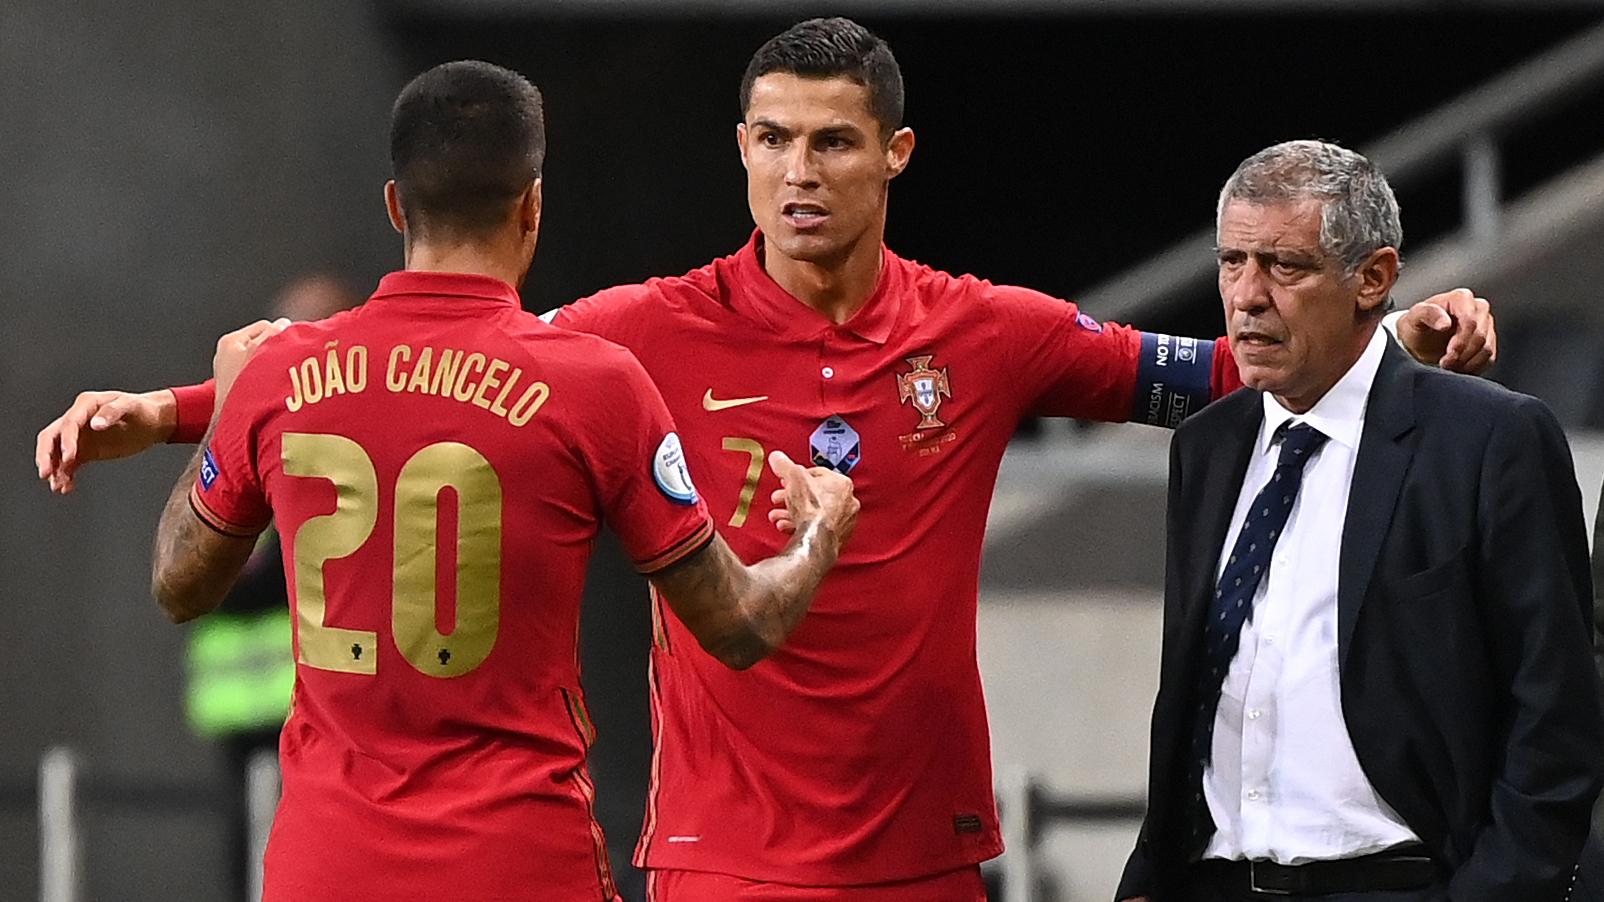 100 is not enough' - Portugal hero Ronaldo proud of breaking goals record |  Goal.com